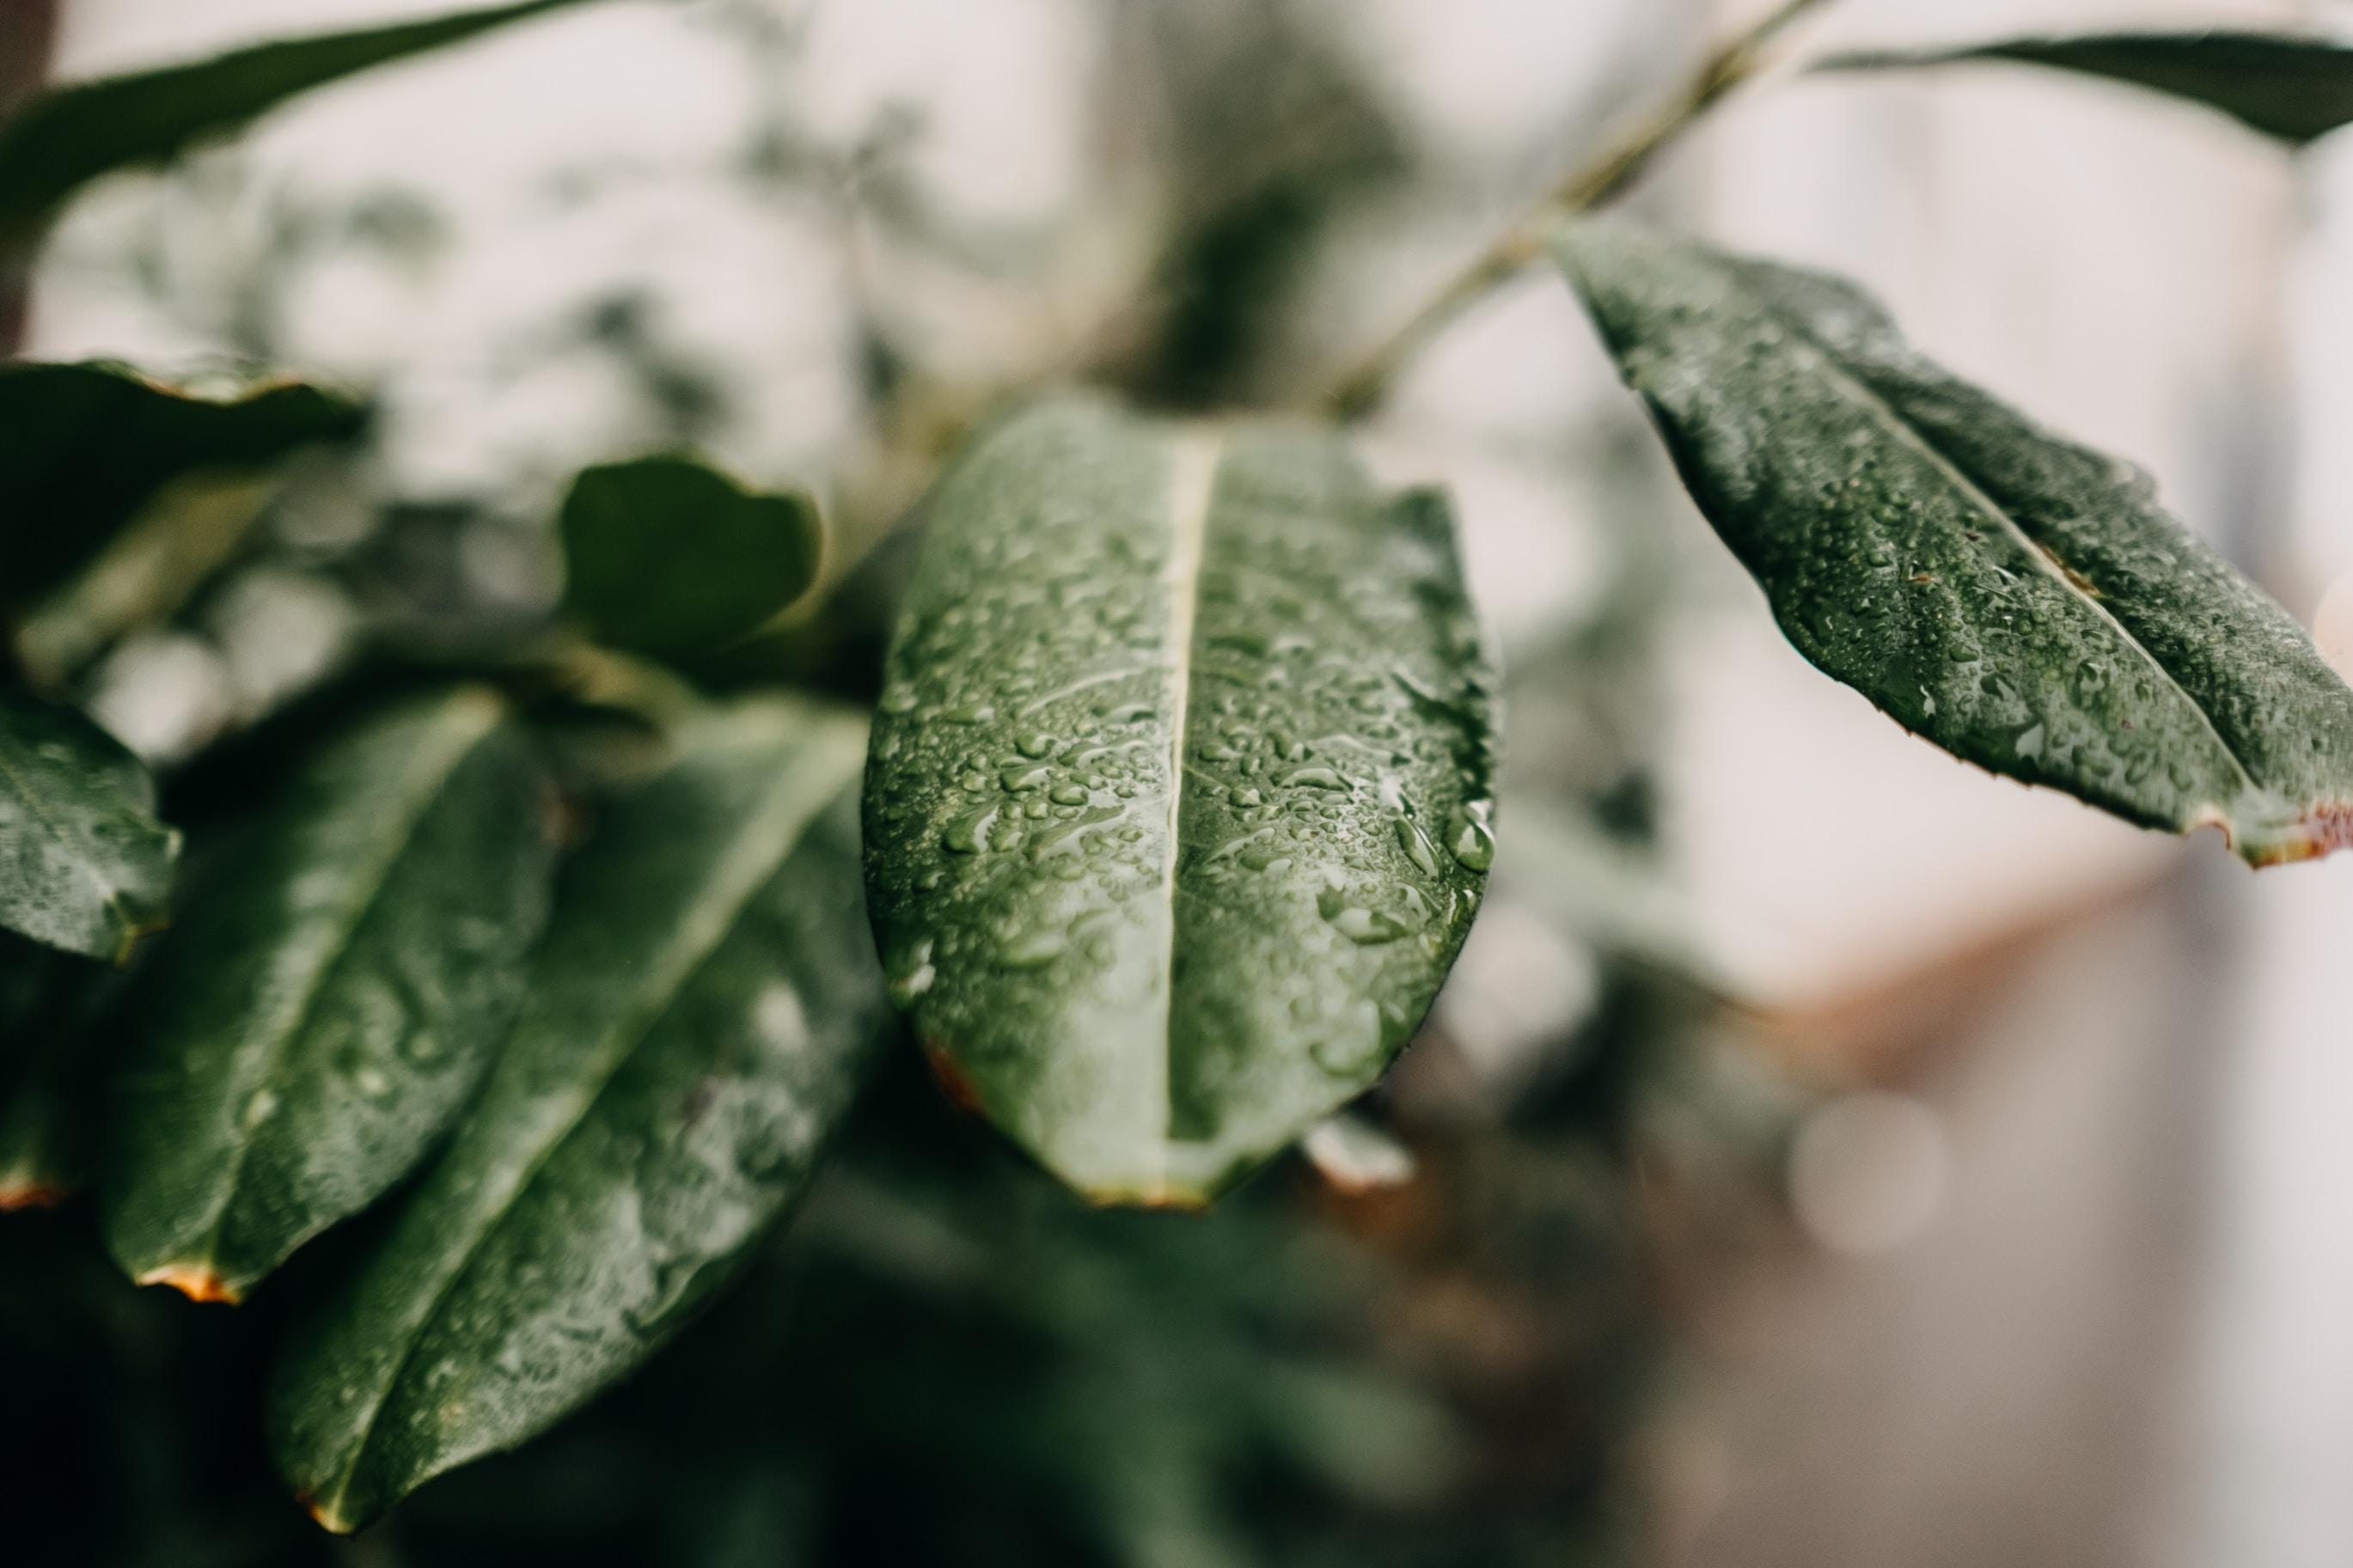 macro shot of plant